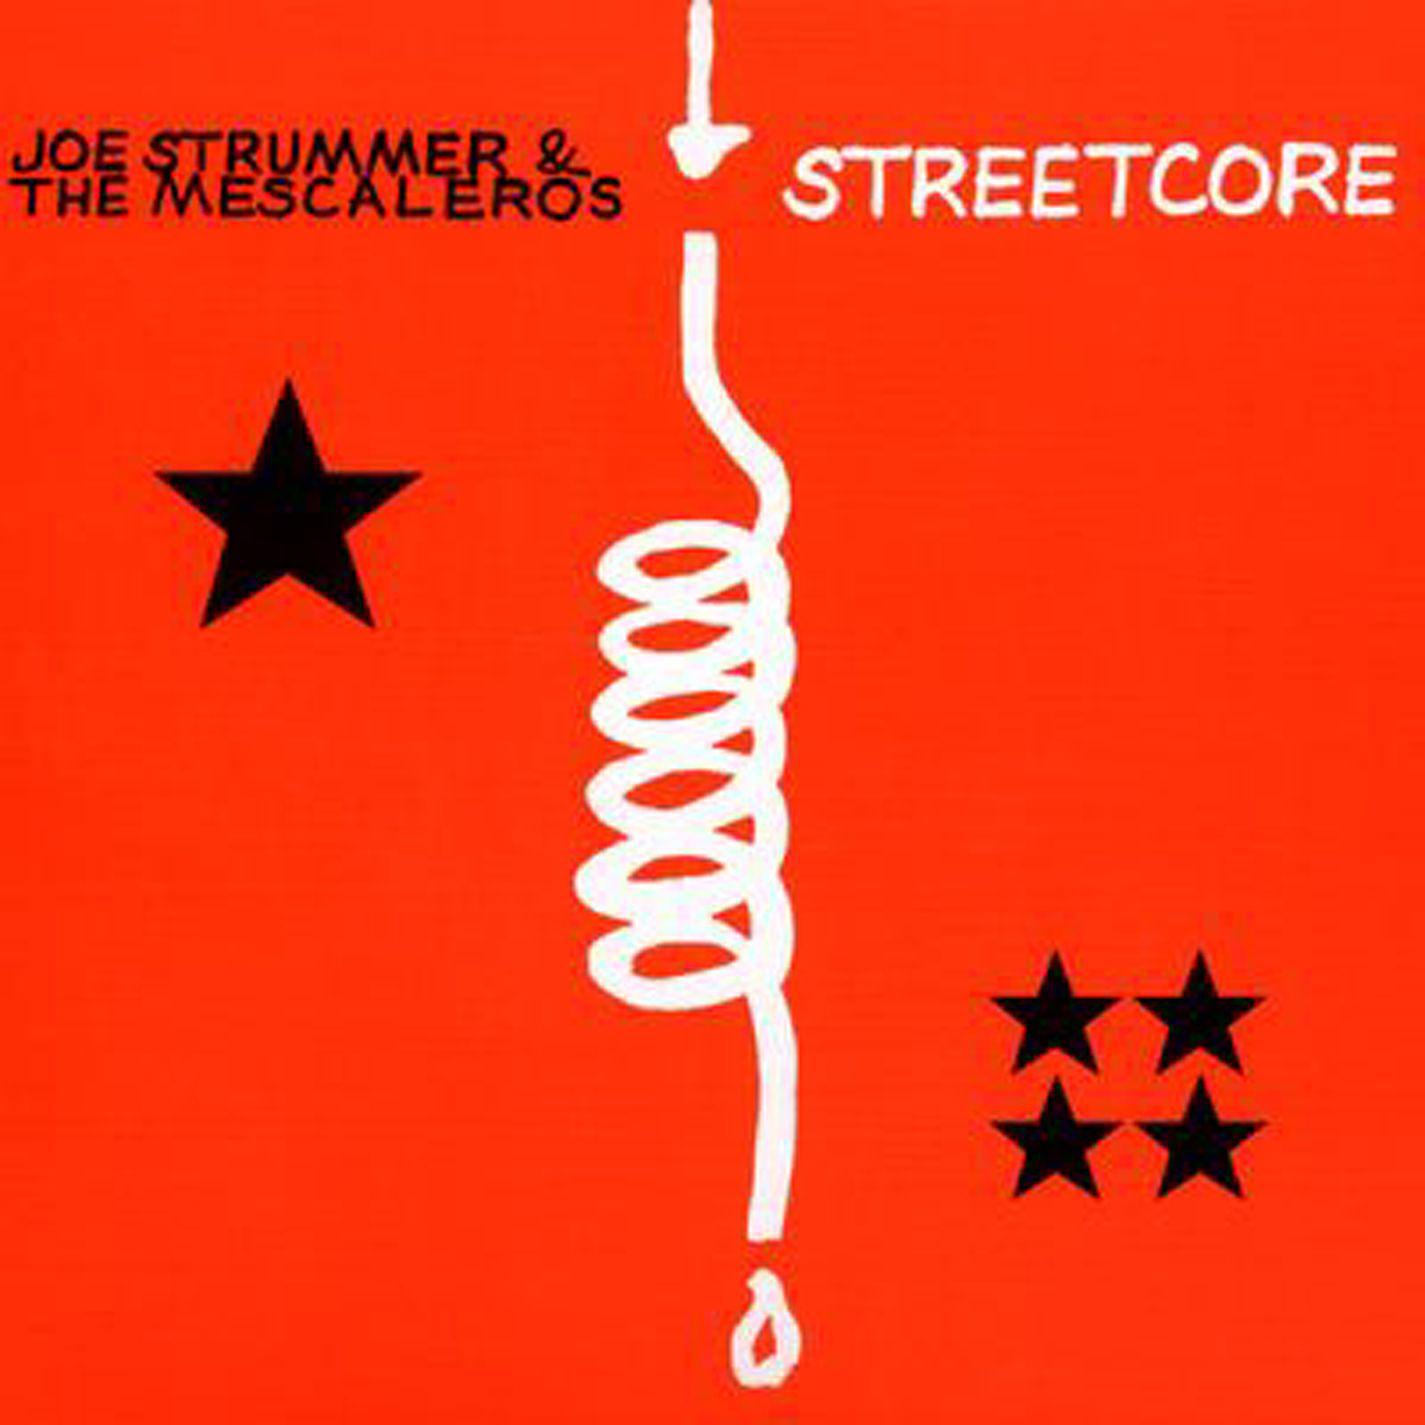 Joe Strummer and the Mescaleros Streetcore.jpg